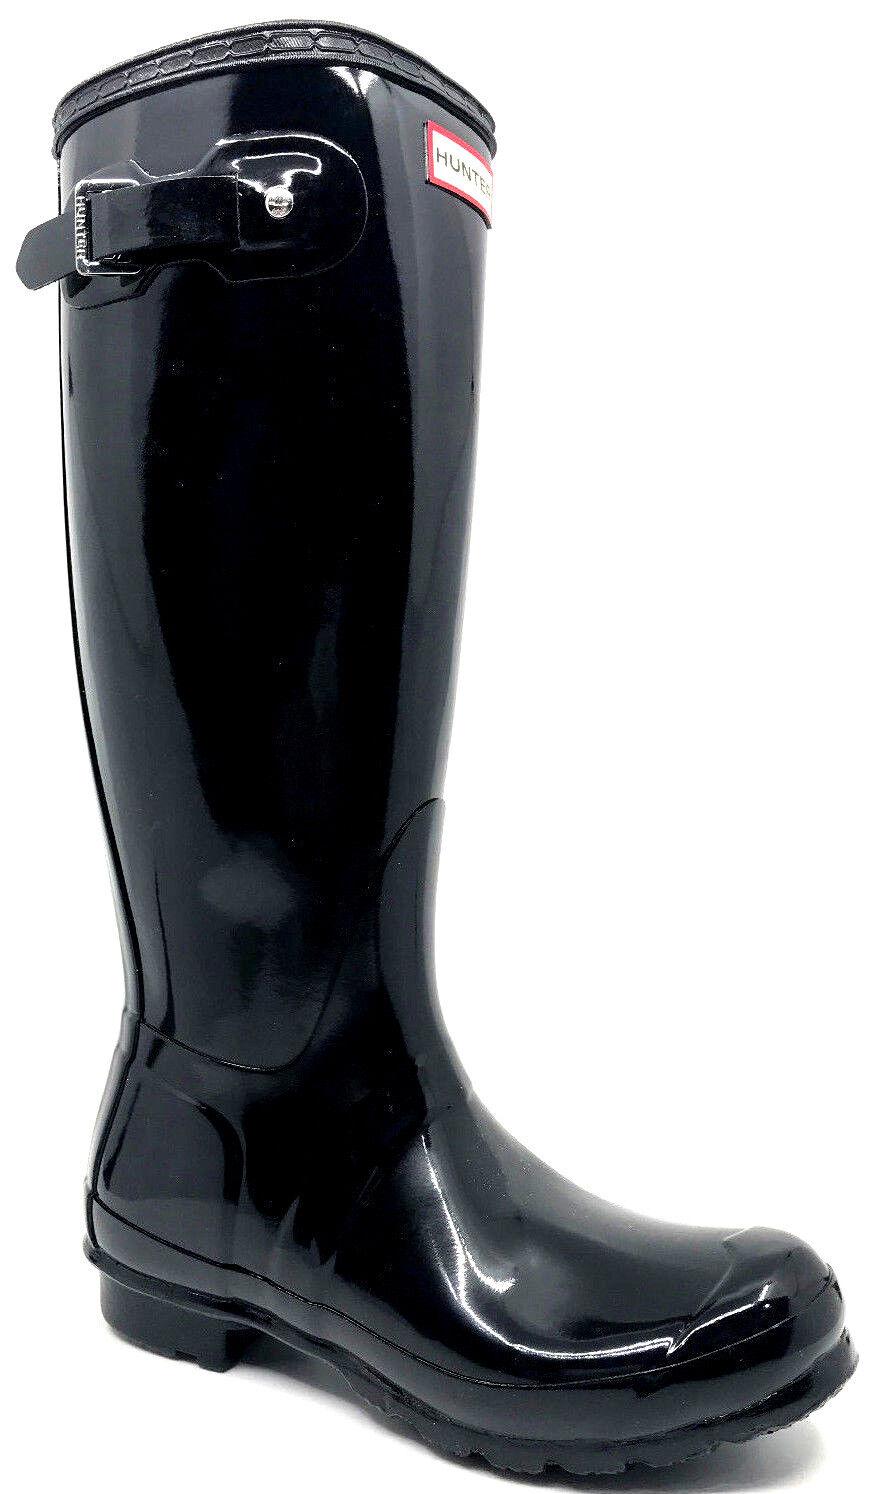 Hunter Hunter Hunter Original Tall Gloss Lluvia Bota Negro wft1000rgl para mujer Talla 7  a la venta